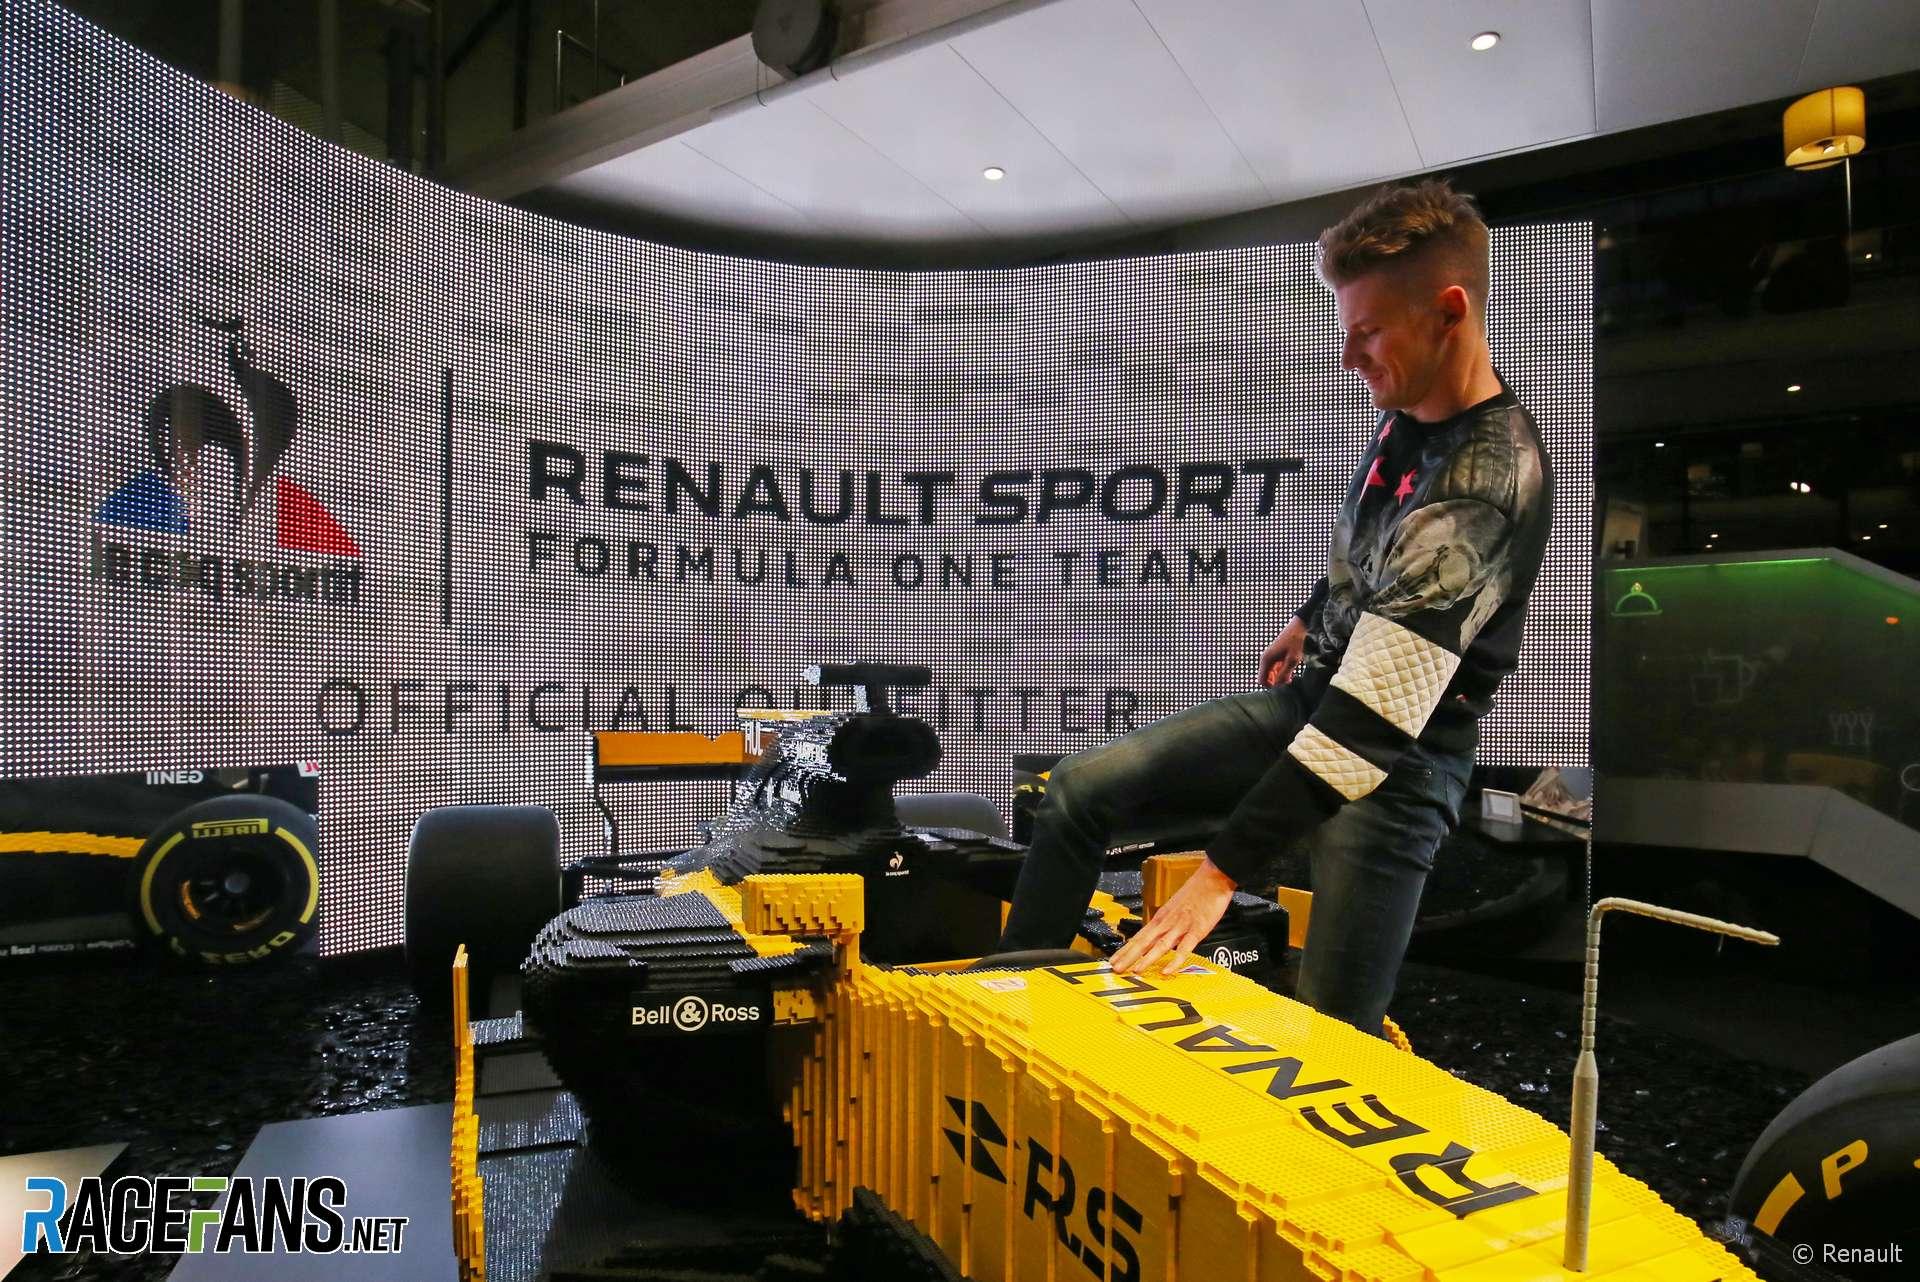 Nico Hulkenberg, Lego Renault F1 car, 2018